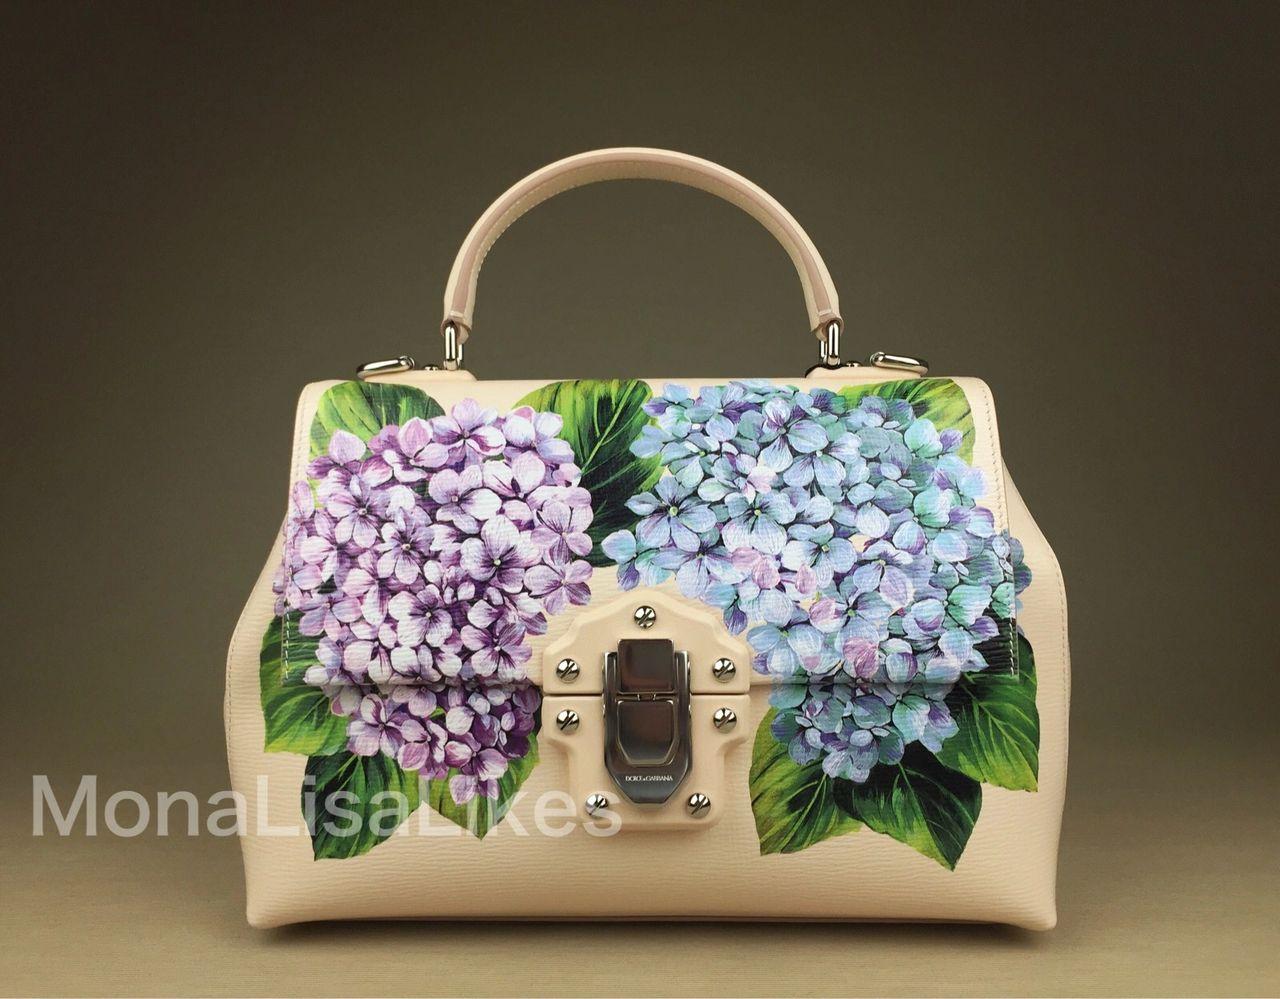 DOLCE & GABBANA Lucia handbag with Hydrangea print